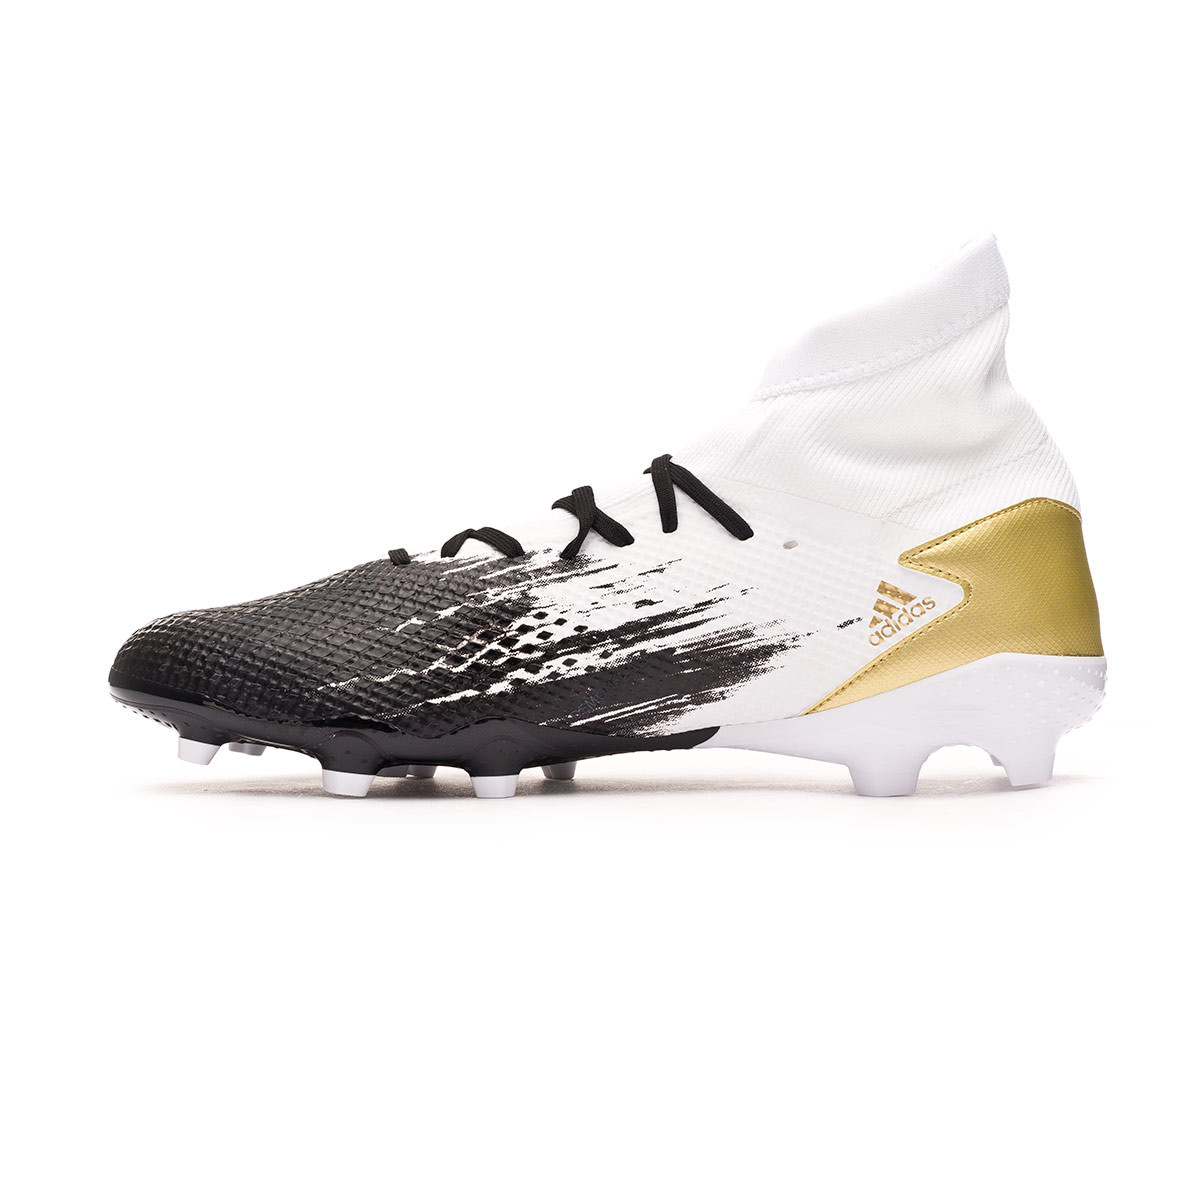 Brz|Gold Football Boot On X Cross Football//Soccer Trophy